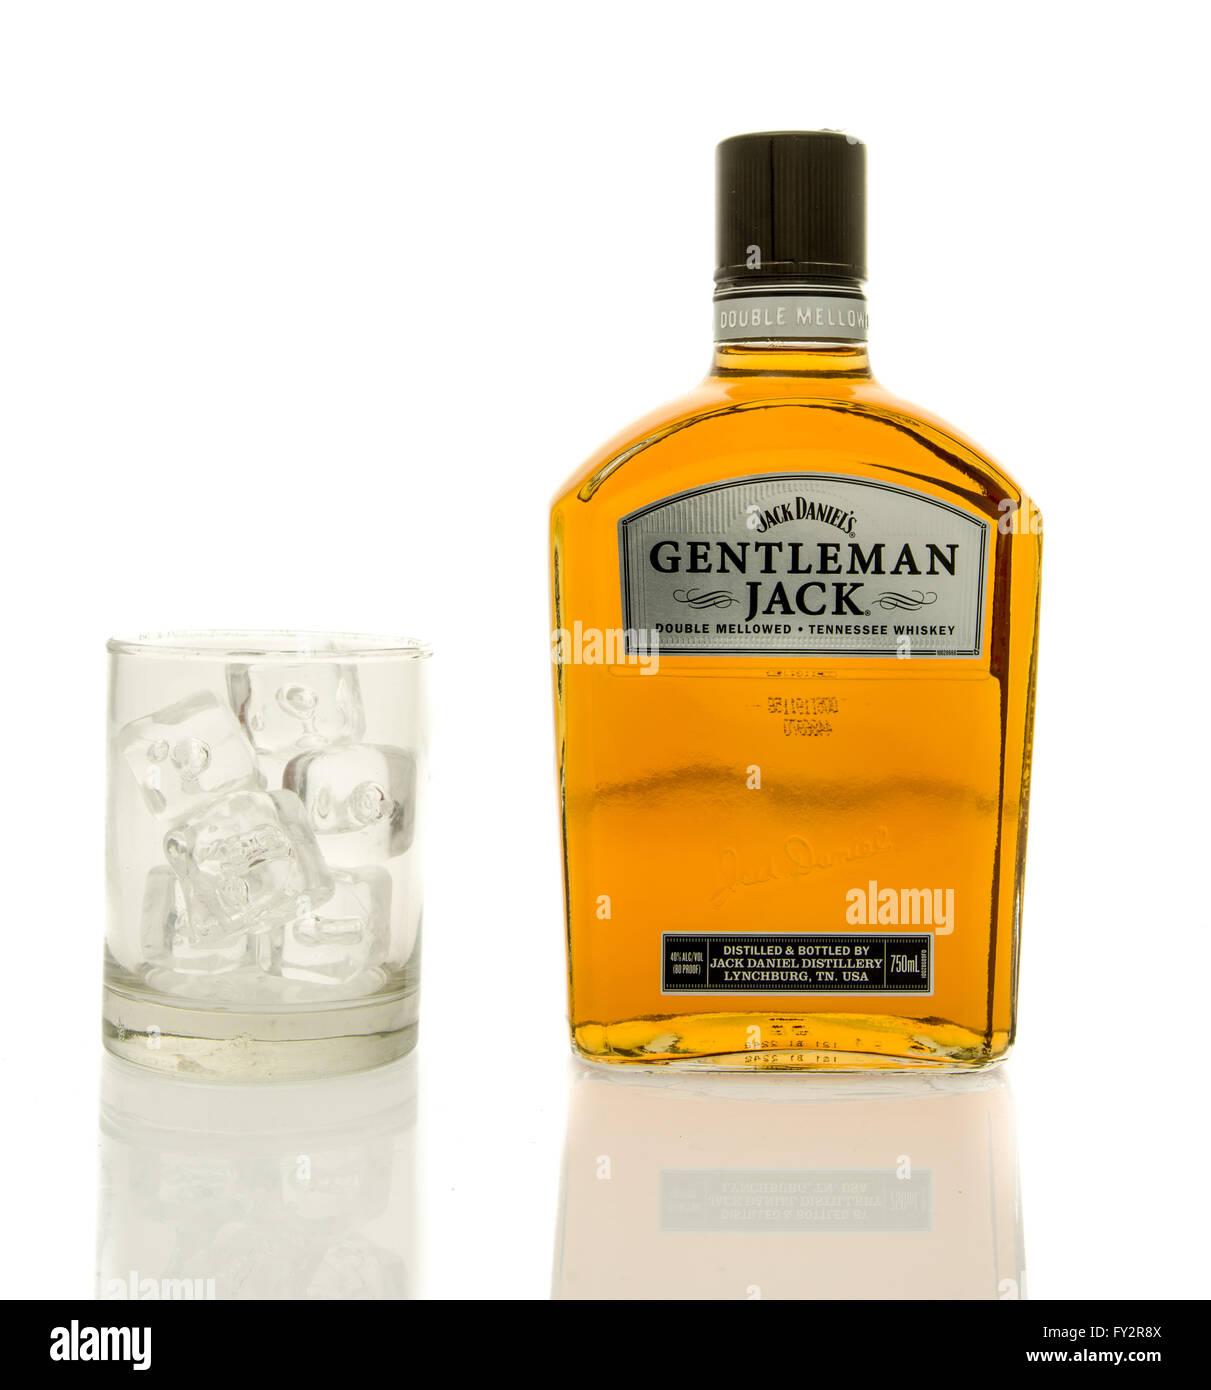 Jack Daniels Glass Fotos & Jack Daniels Glass Imagens de Stock - Alamy